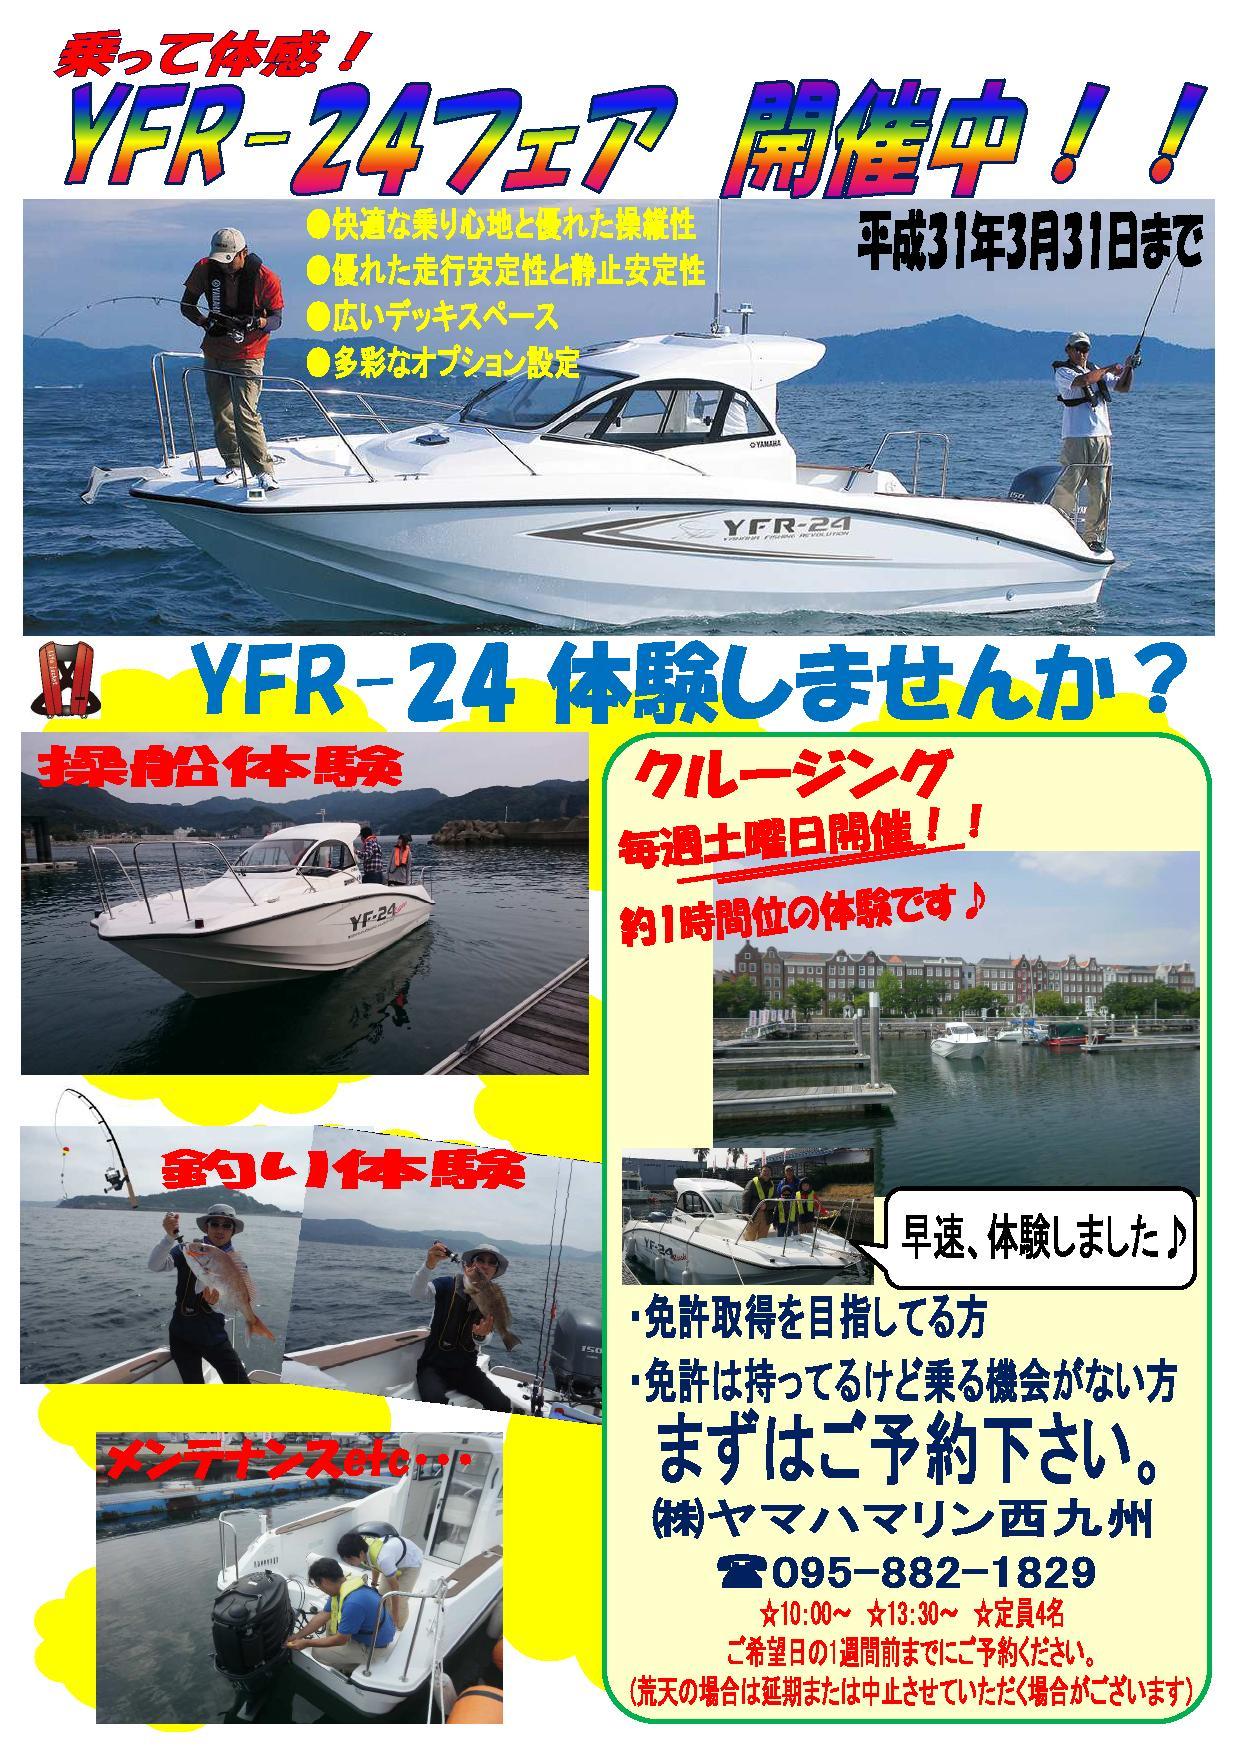 YFR24試乗会 開催!!